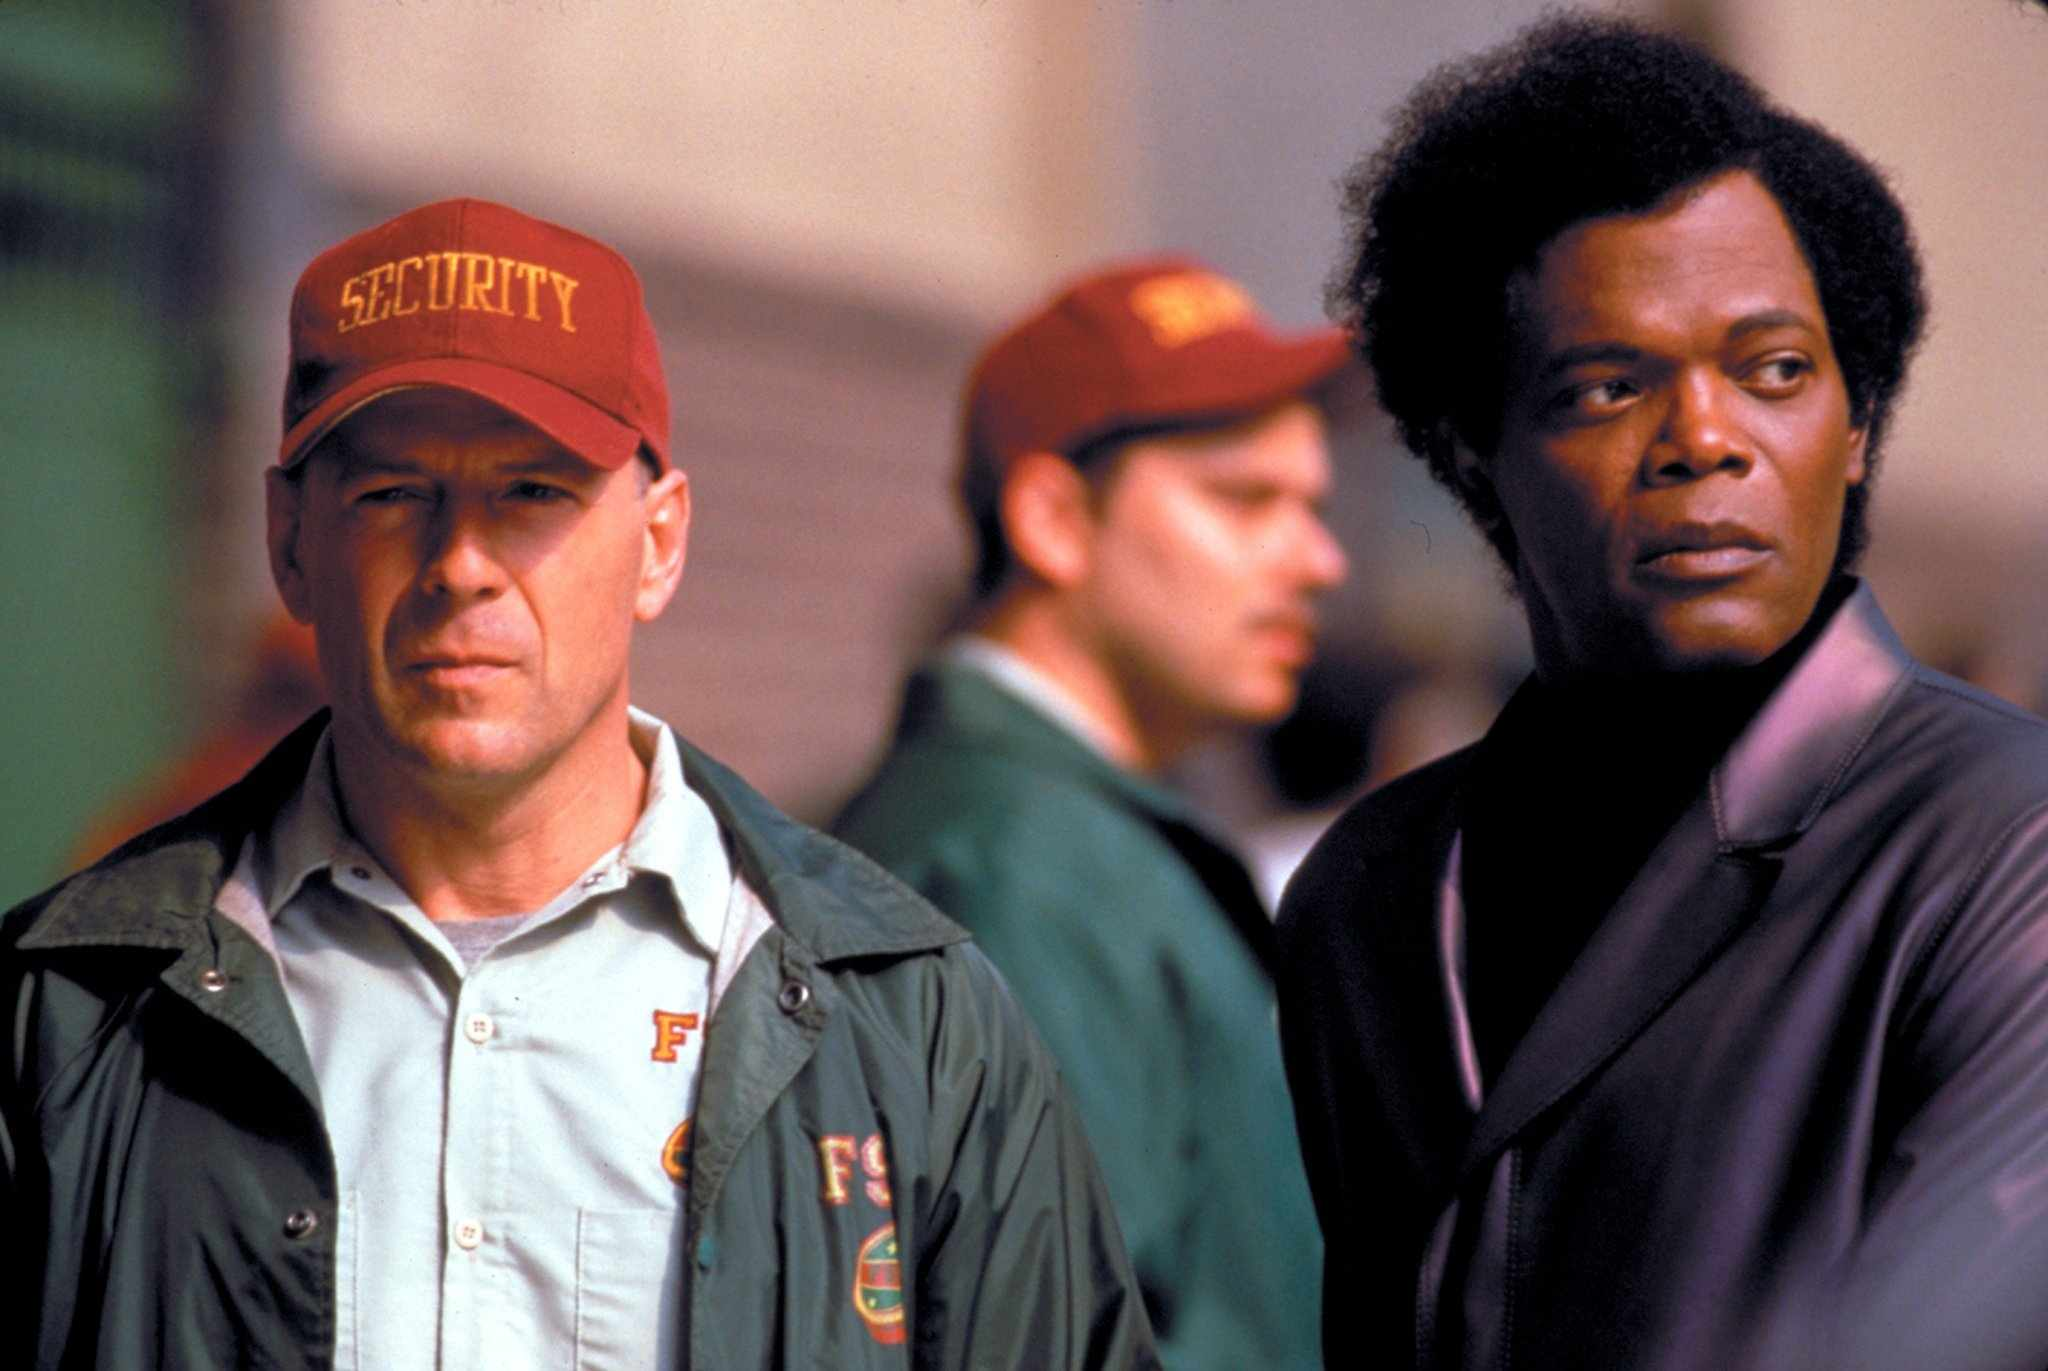 Bruce Willis and Samuel L Jackson